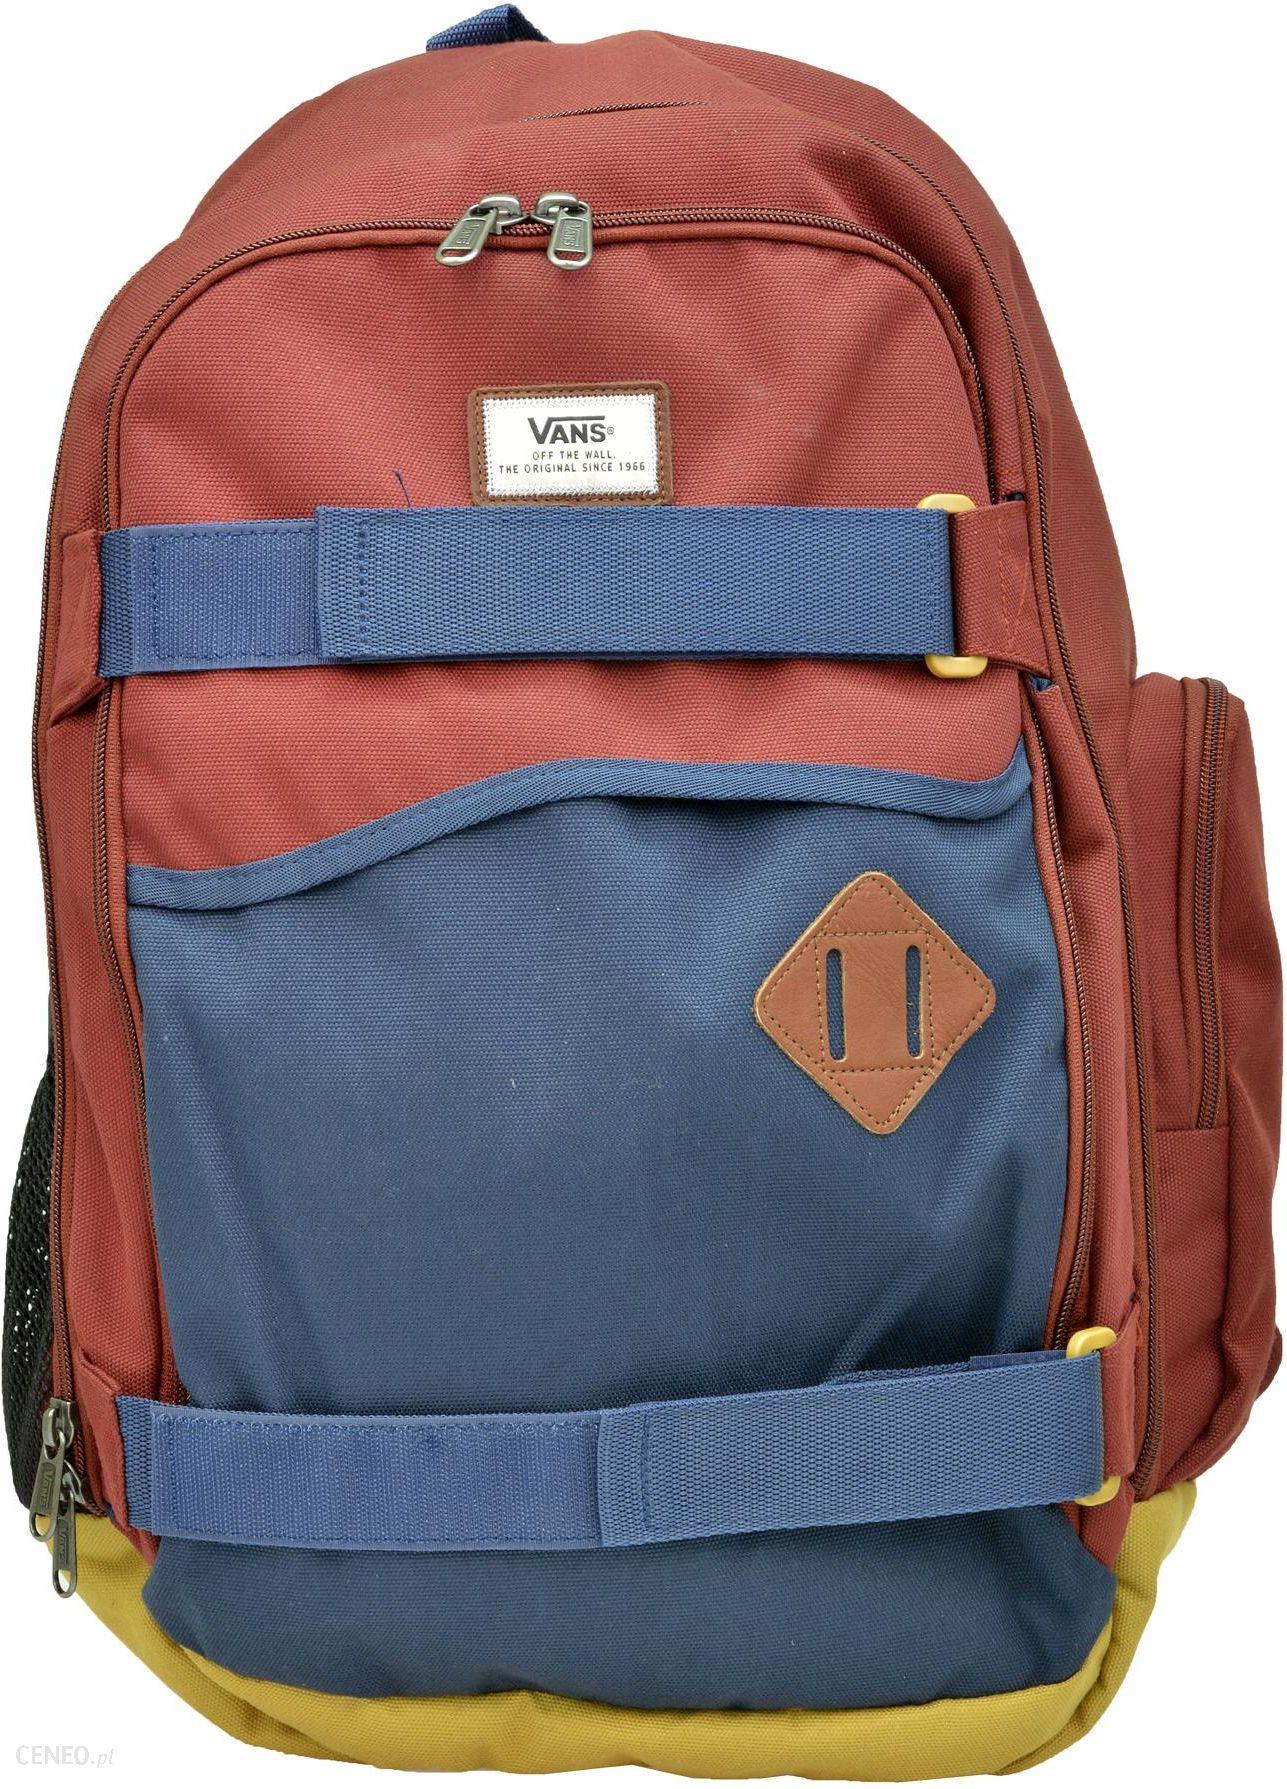 33cdc332fecc80 Plecak Vans Transient Ii Skatepack Backpack Vuyghbg - Ceny i opinie ...